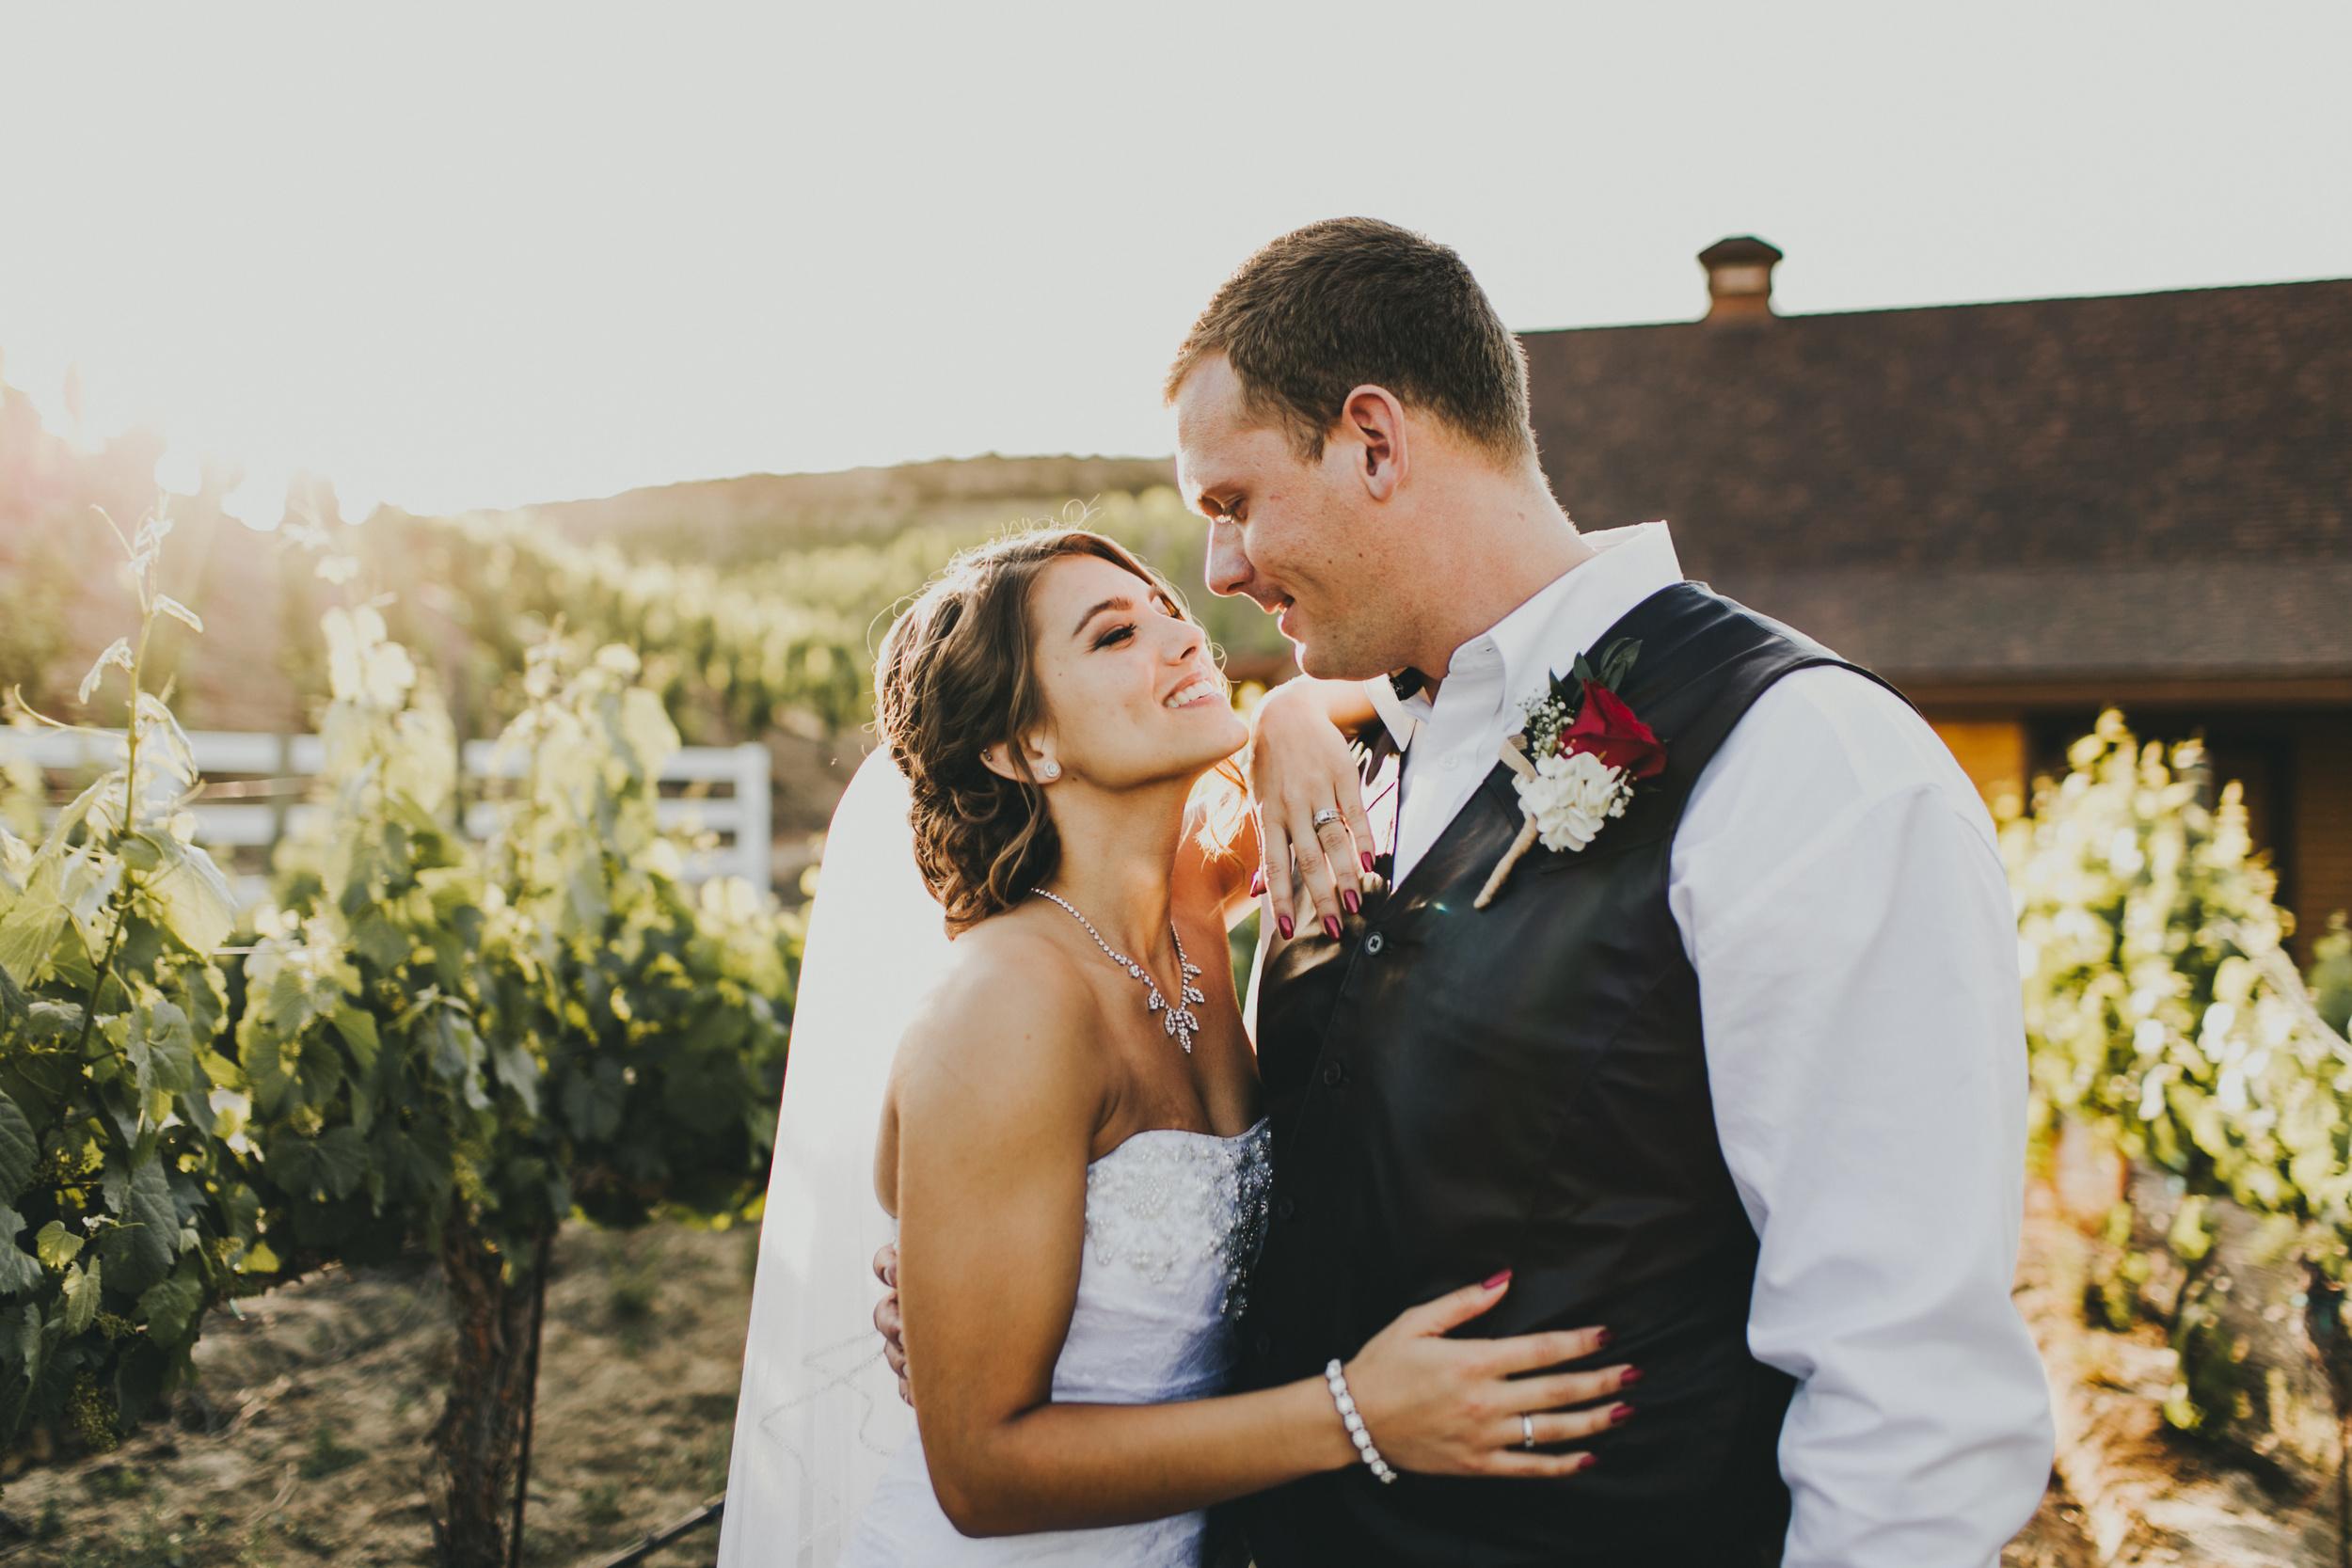 Cheyenne + Jordan - Wedding, Natalie Griffo (80 of 157).jpg